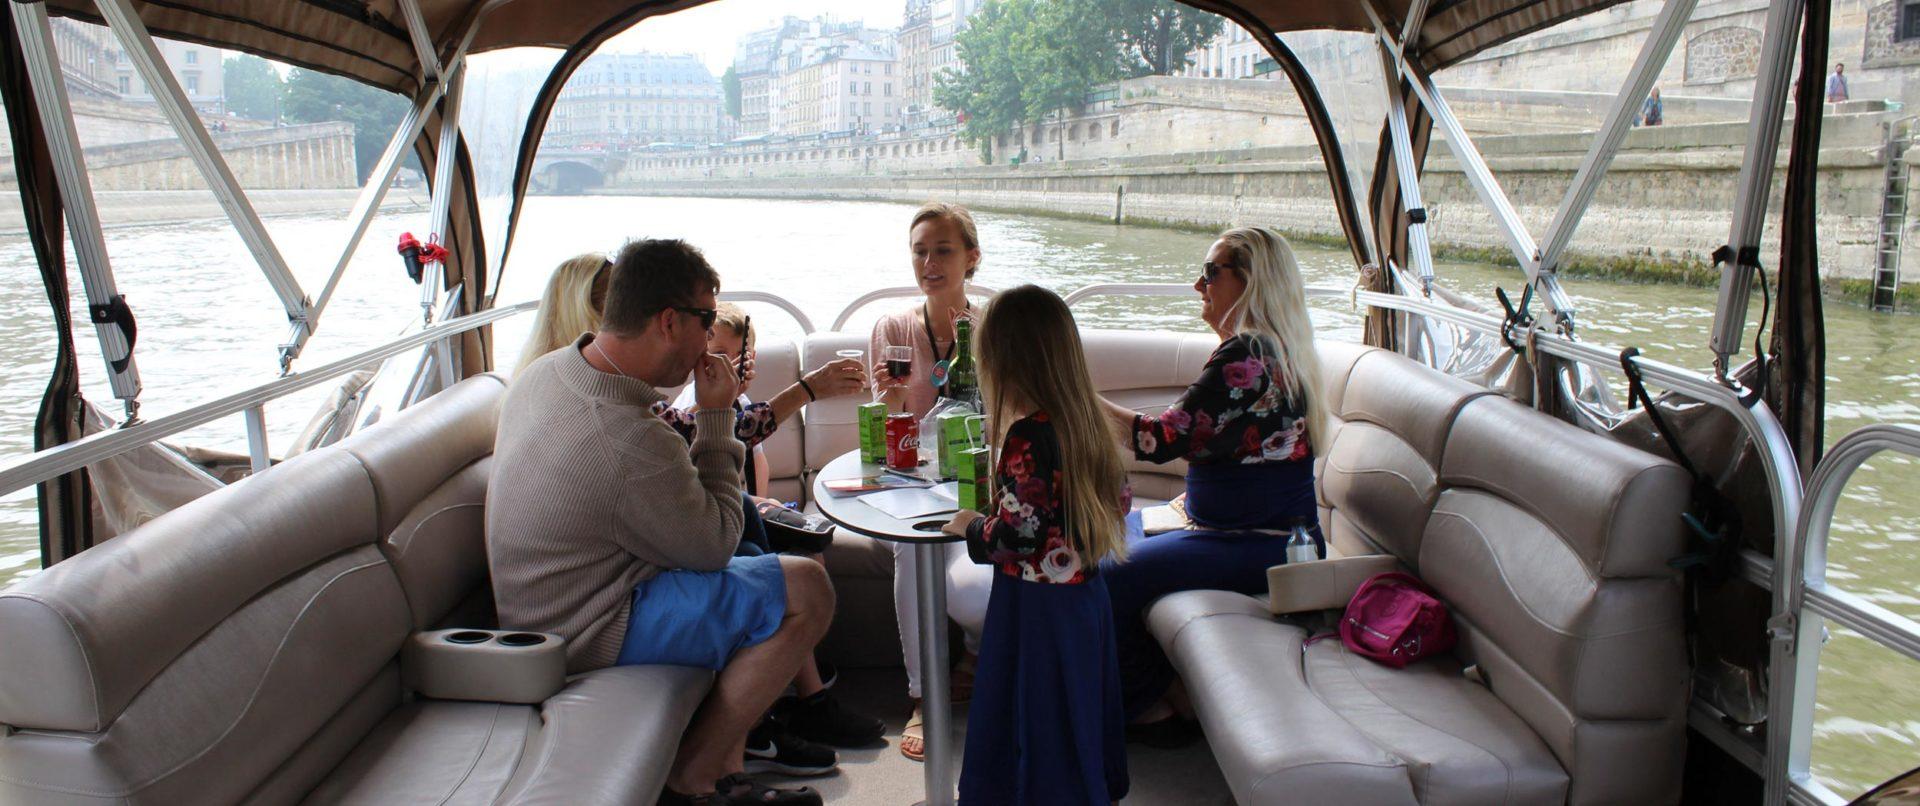 paris-river-cruise-luxury-experience